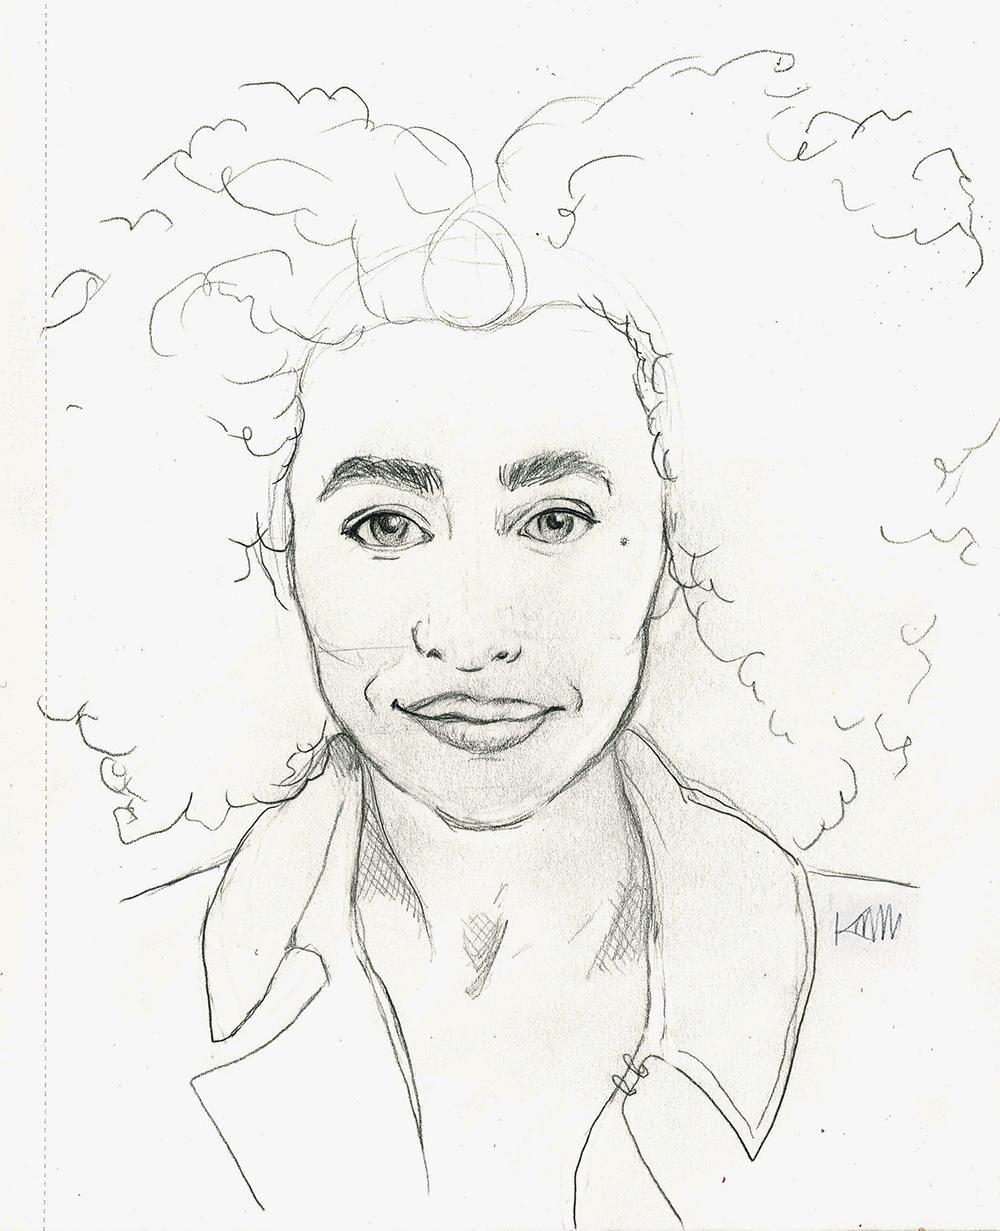 Minimalist Portrait in Pencil  - image 2 - student project